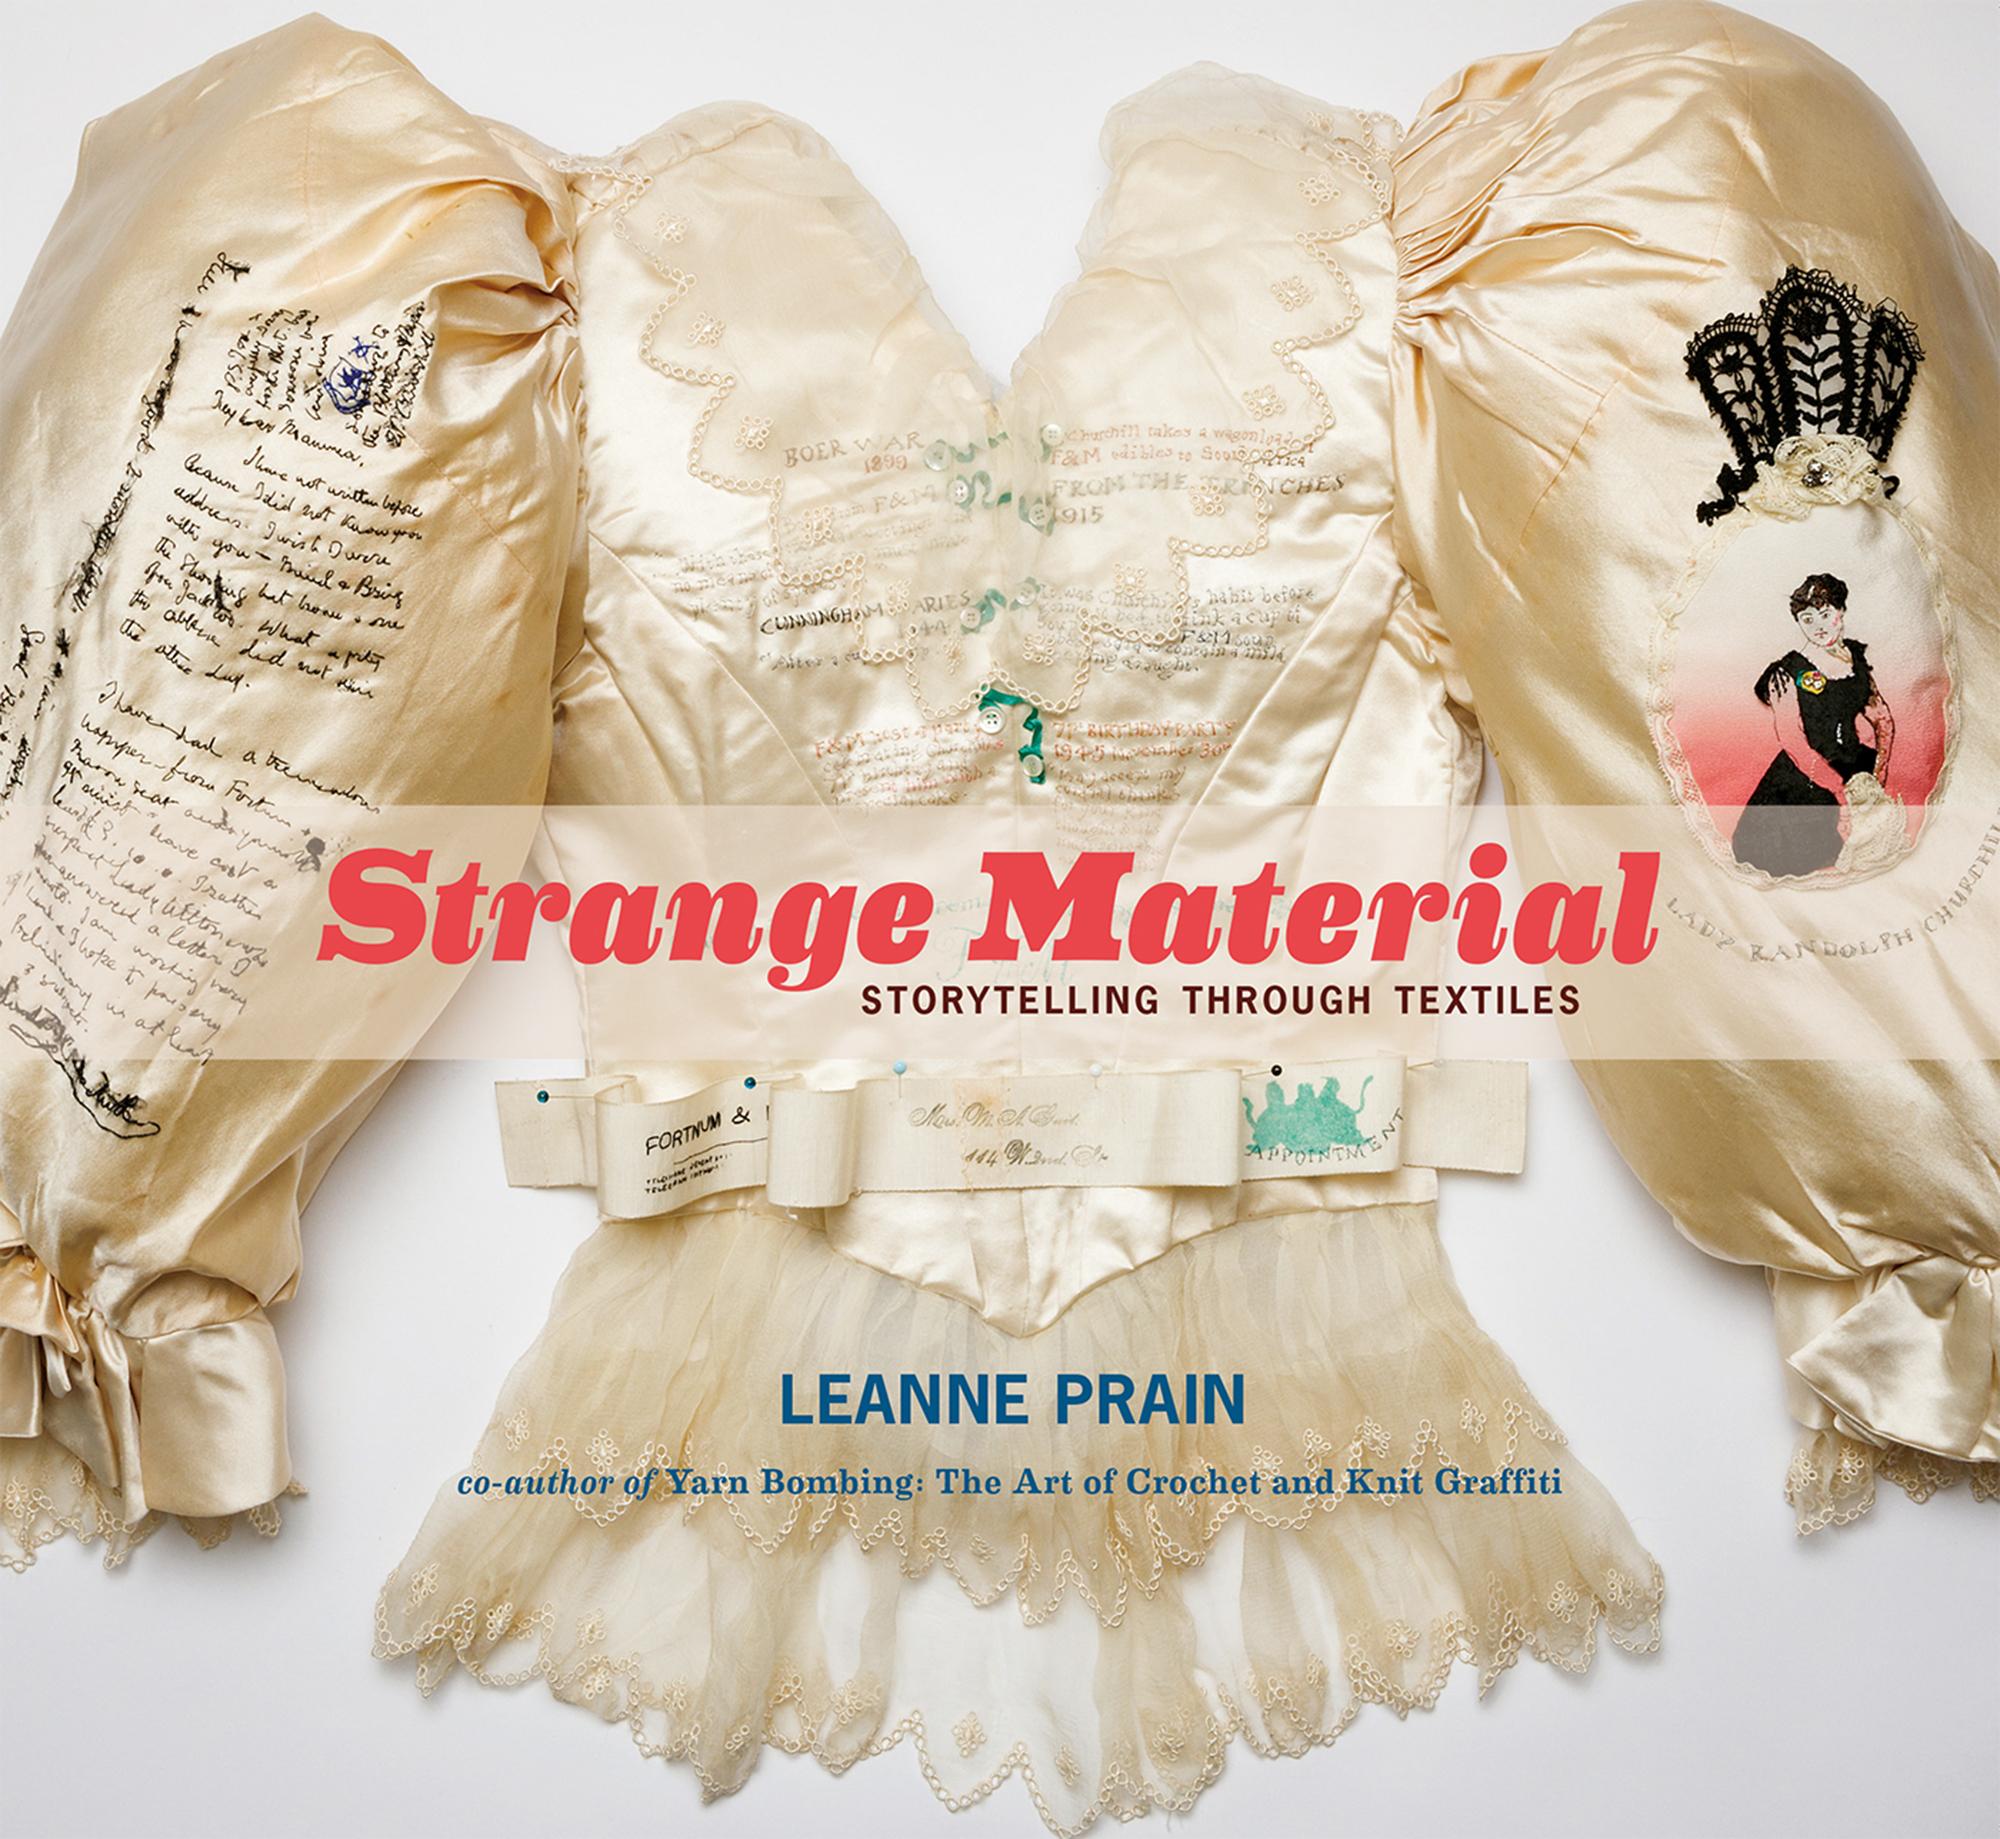 Strange Material Storytelling through Textiles